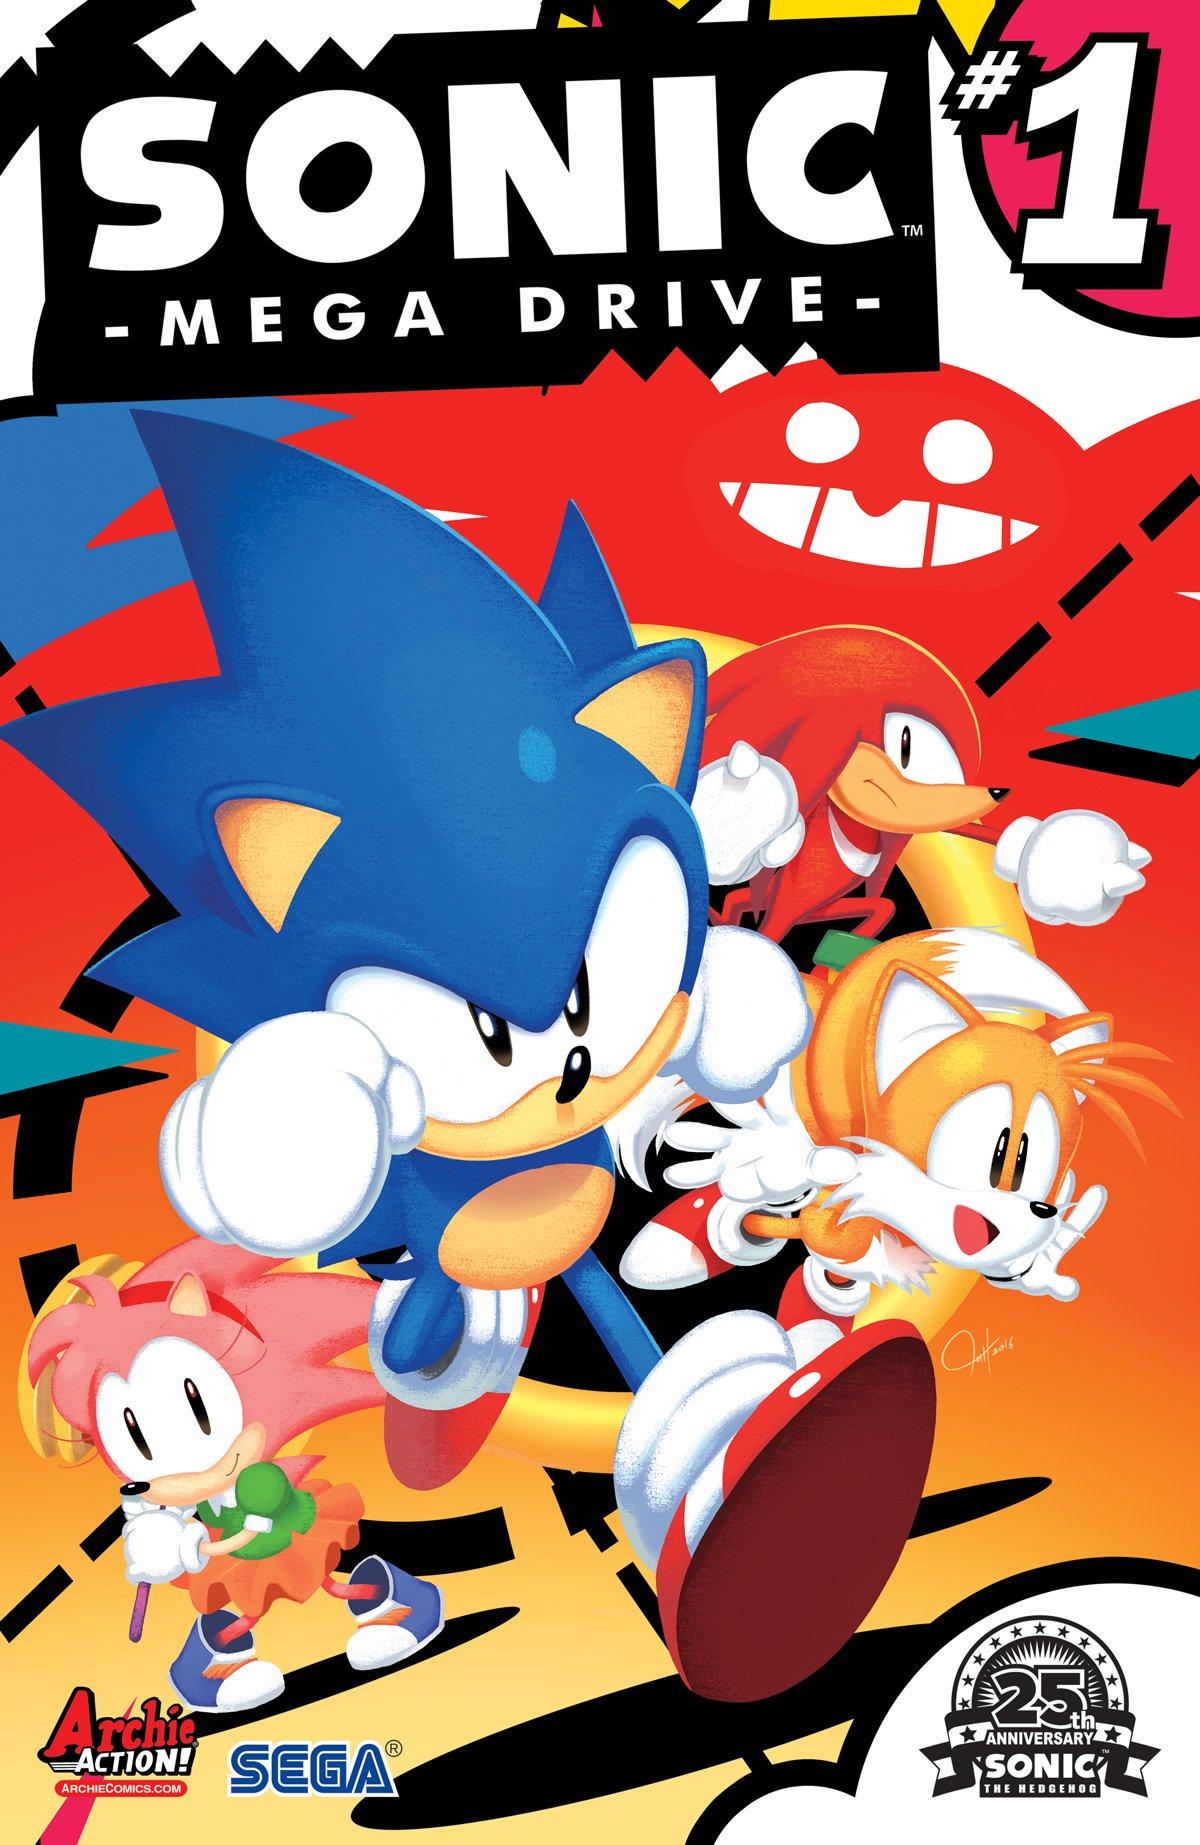 Sonic Mega Drive (August 2016)